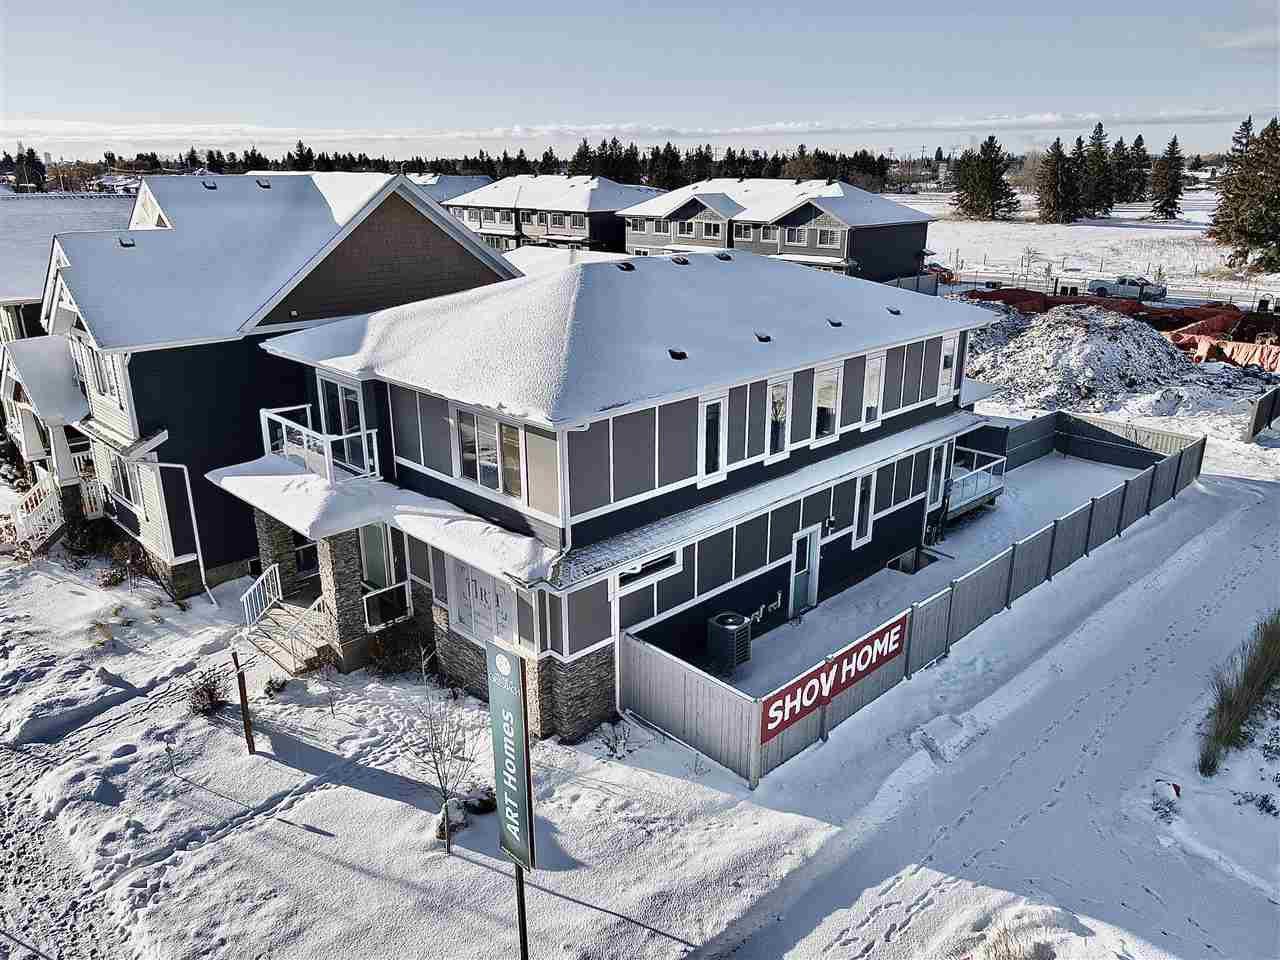 Main Photo: 943 VALOUR Way in Edmonton: Zone 27 House for sale : MLS®# E4221977